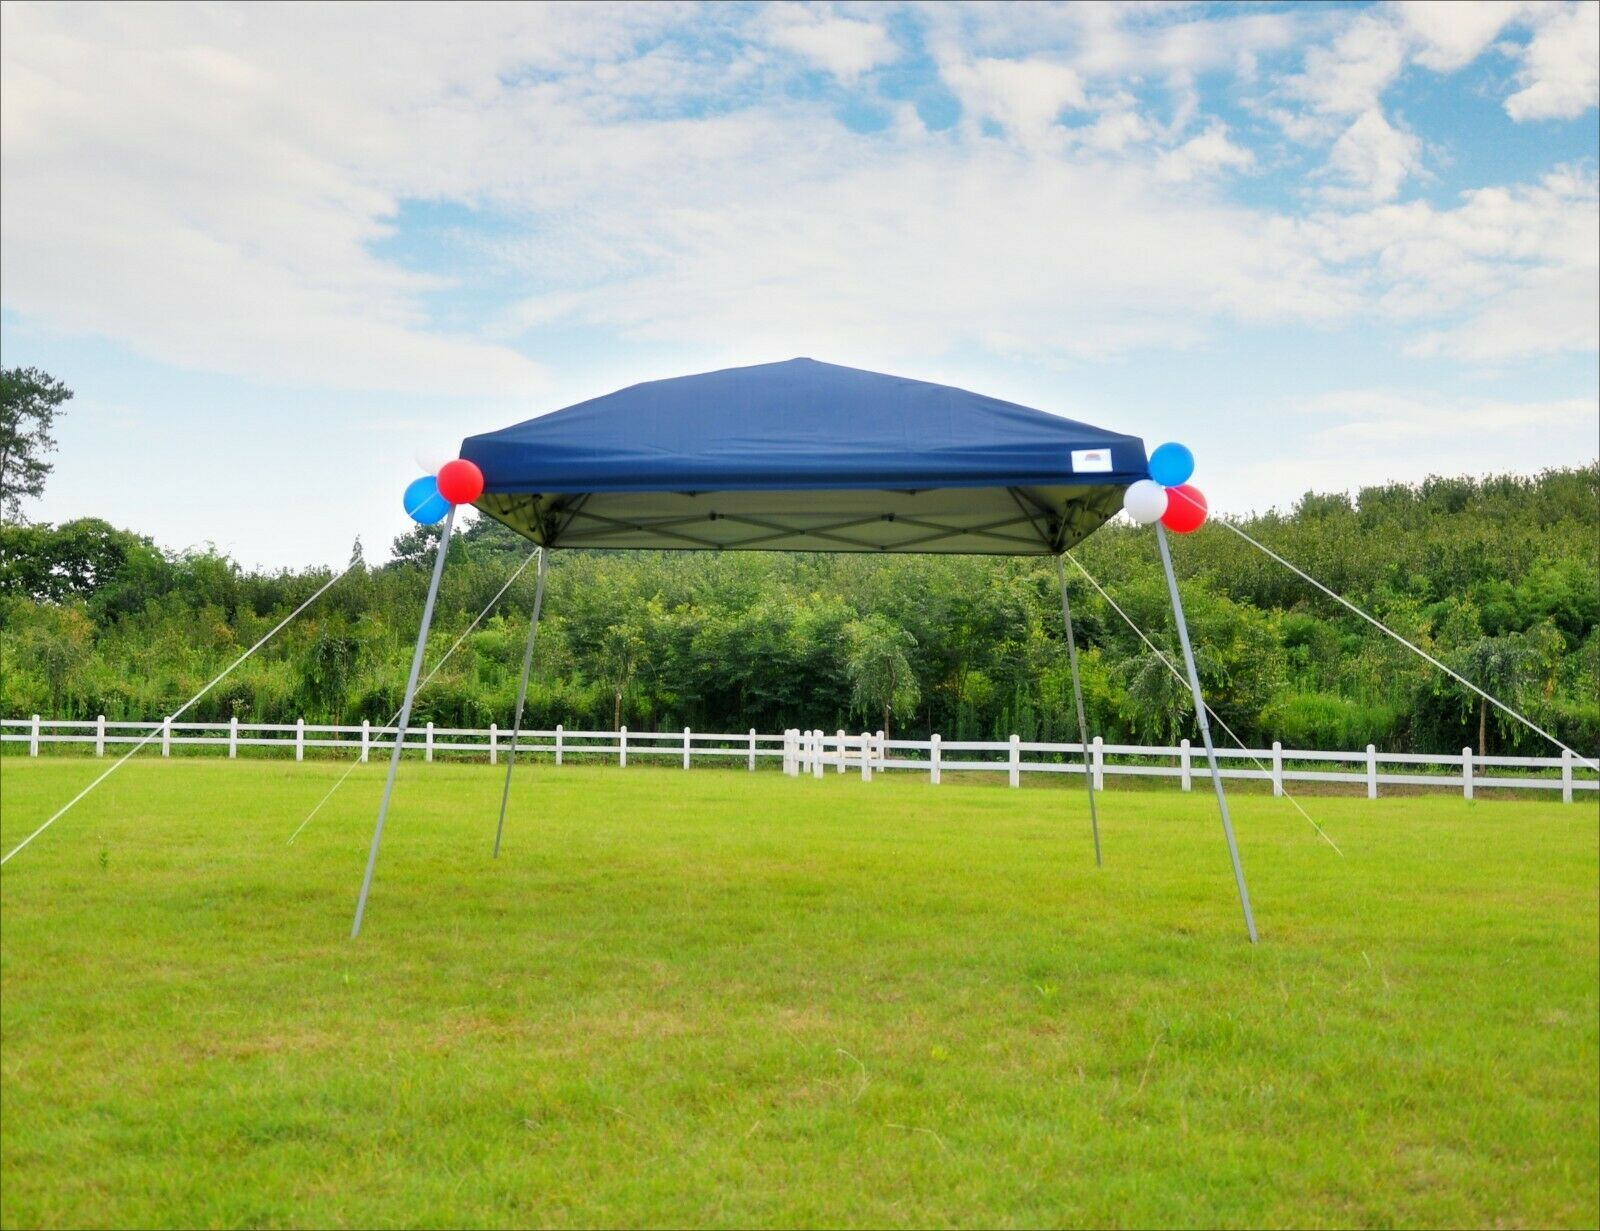 10'x10' EZ Pop Up Canopy Party Tent Outdoor Patio Gazebo Eve